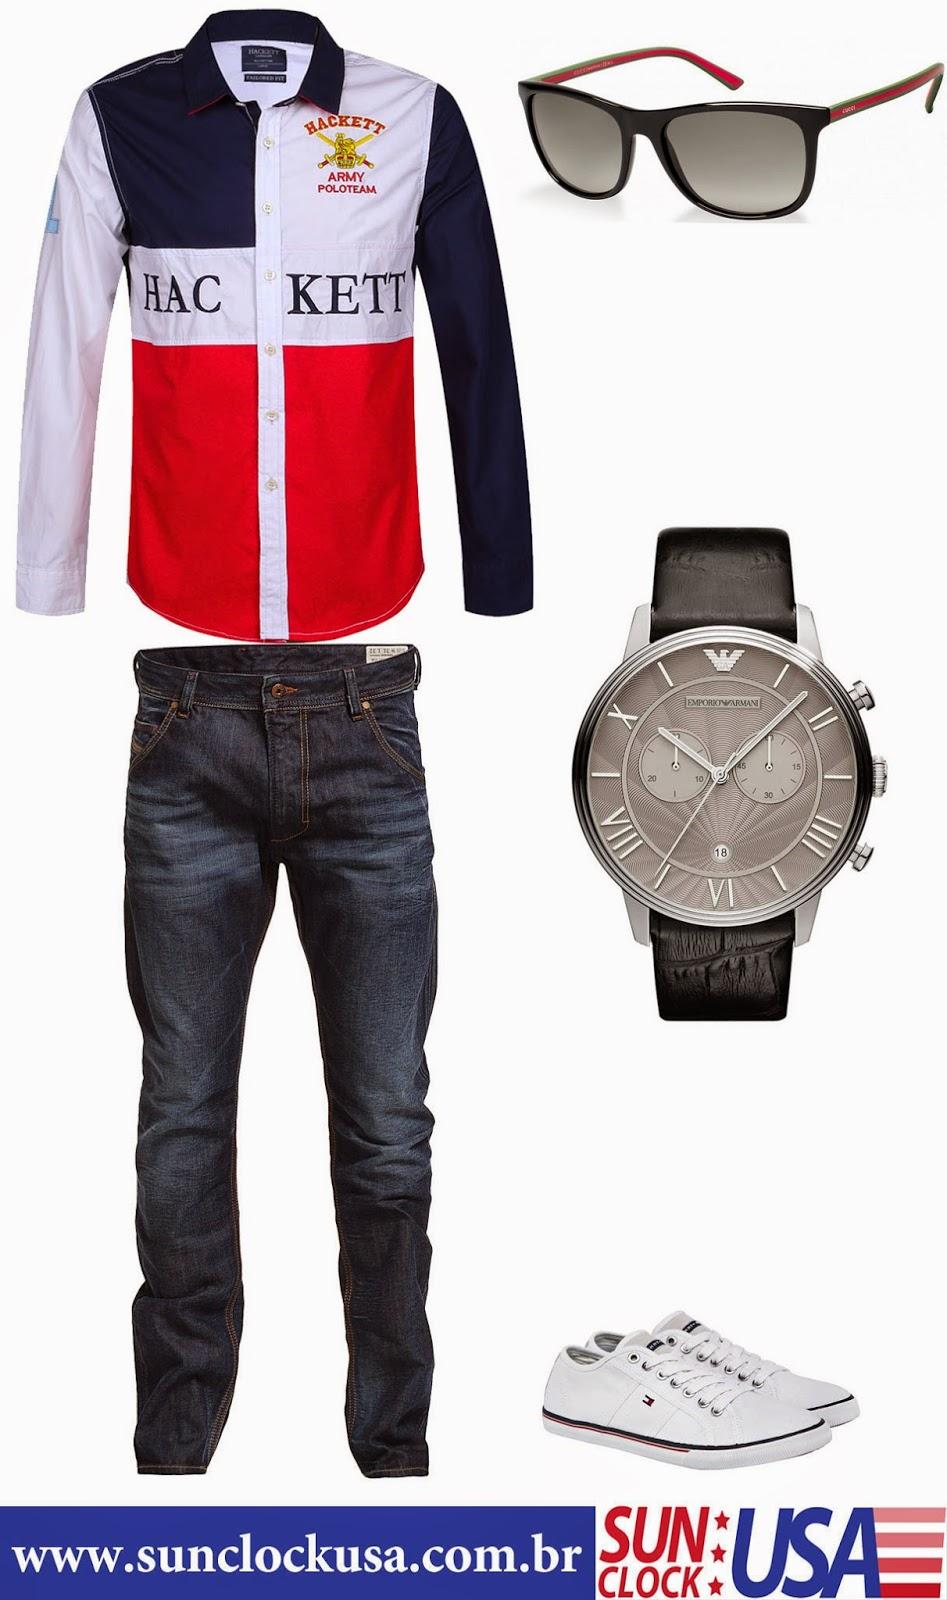 Relógio Emporio Armani AR1615 e Óculos Gucci GC1055/S